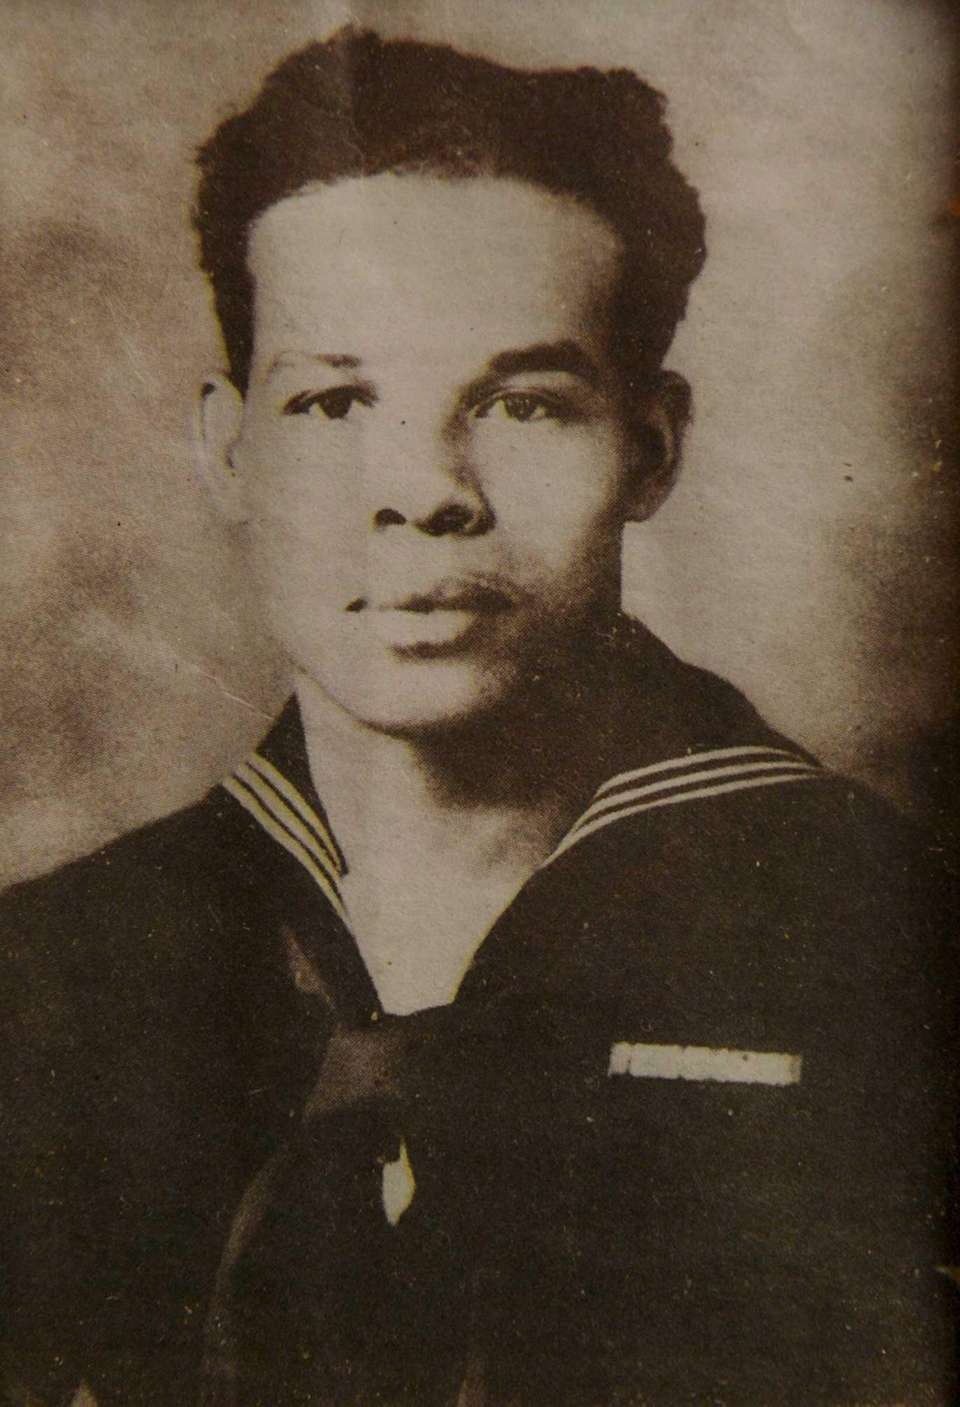 Jim Graham, a Navy veteran and radio operator